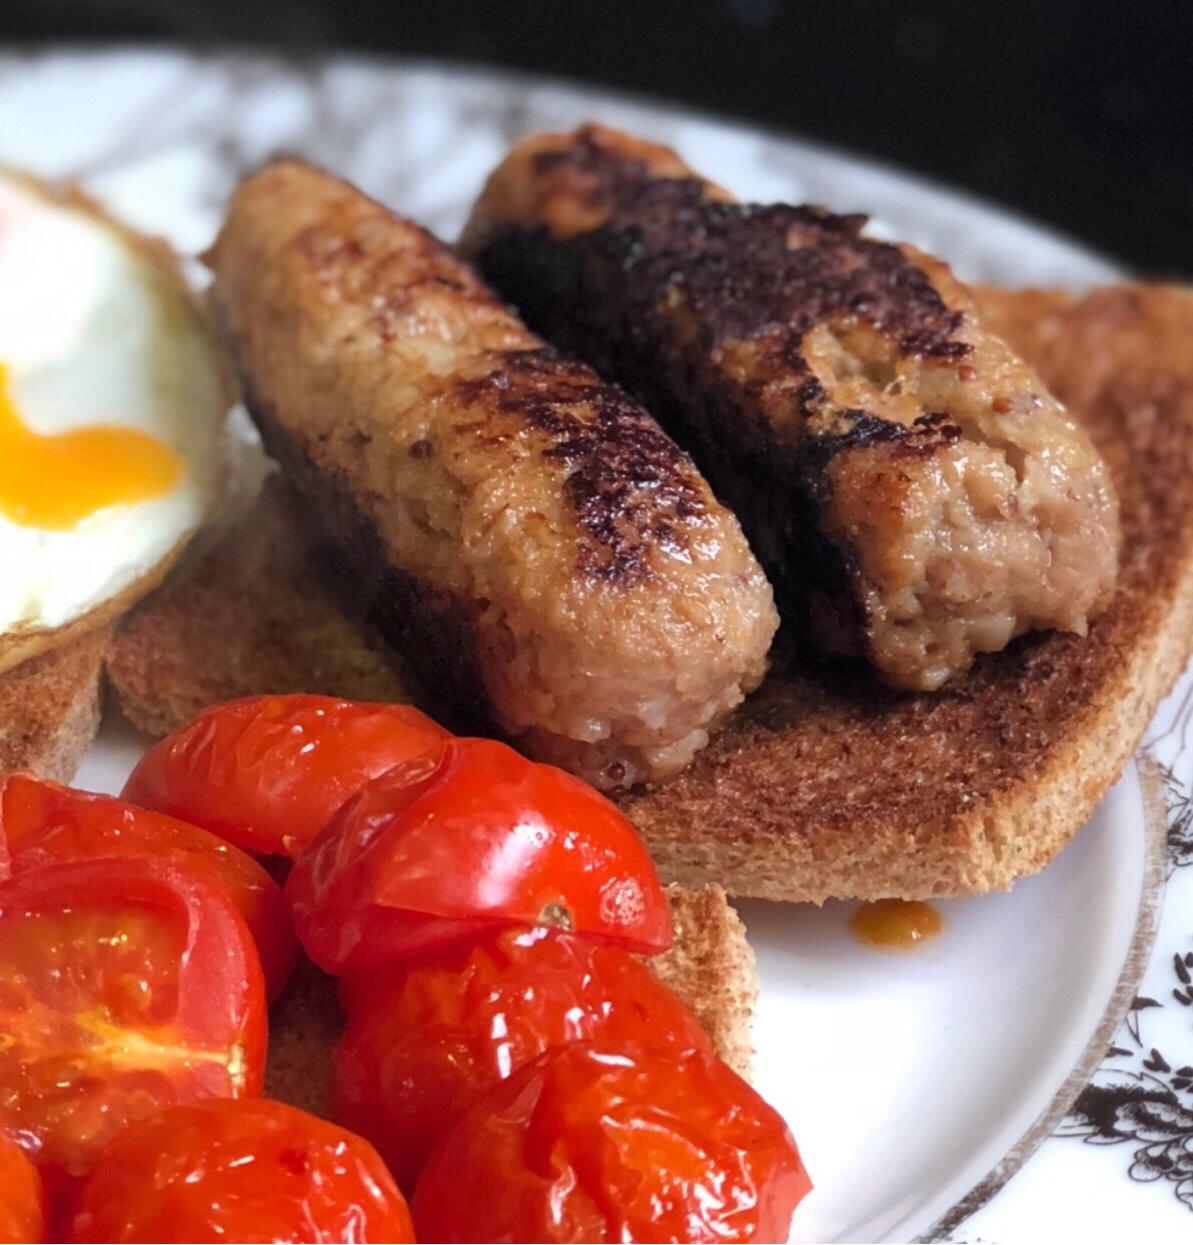 debs_sausages